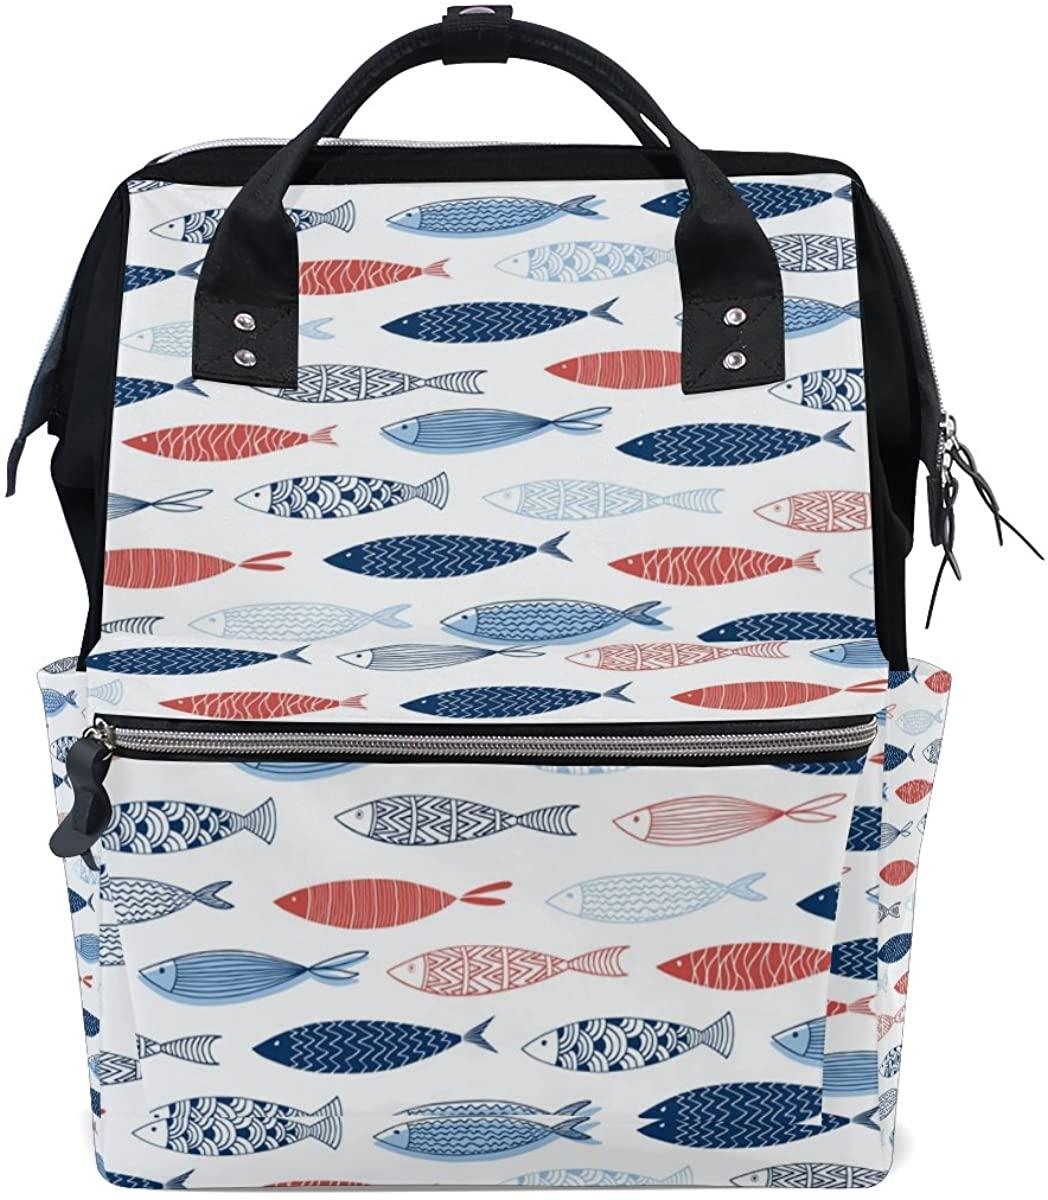 ALAZA Dolphin Fish Ocean Sea Backpack Mummy Nappy Travel Nurse Bag Tote Bag